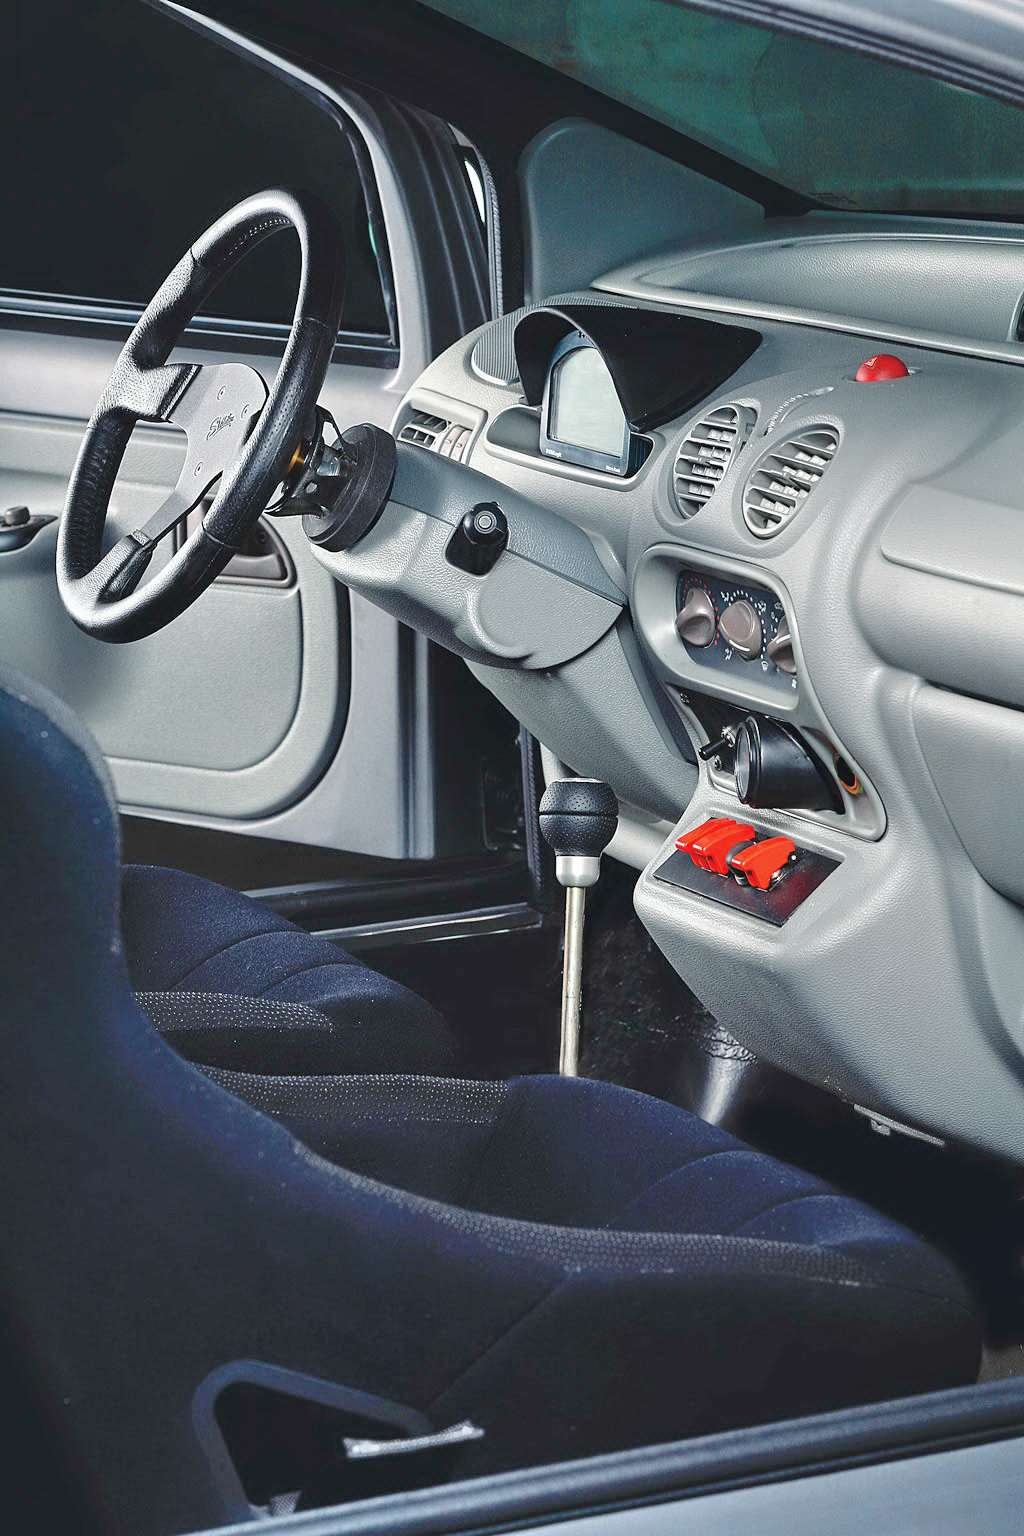 Renault Twingo V8 Trophy 2009 Range Rover